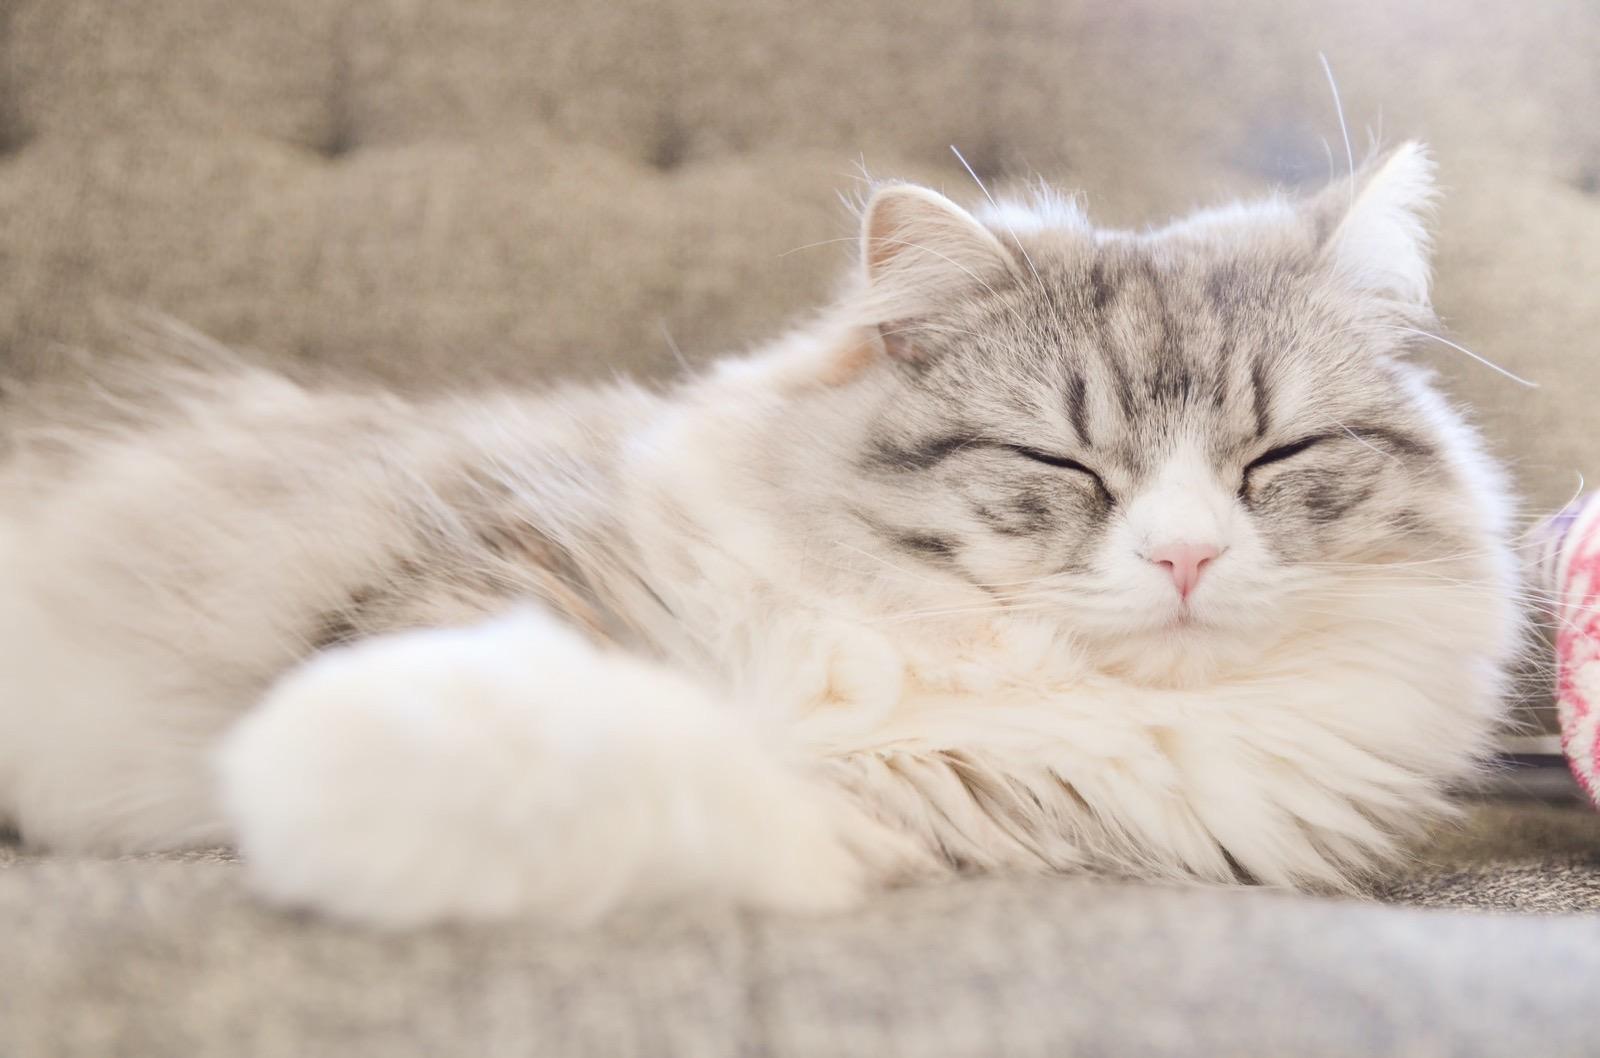 HIR93_sofa-deneteiruneko_TP_V-sleeping-cat.jpg